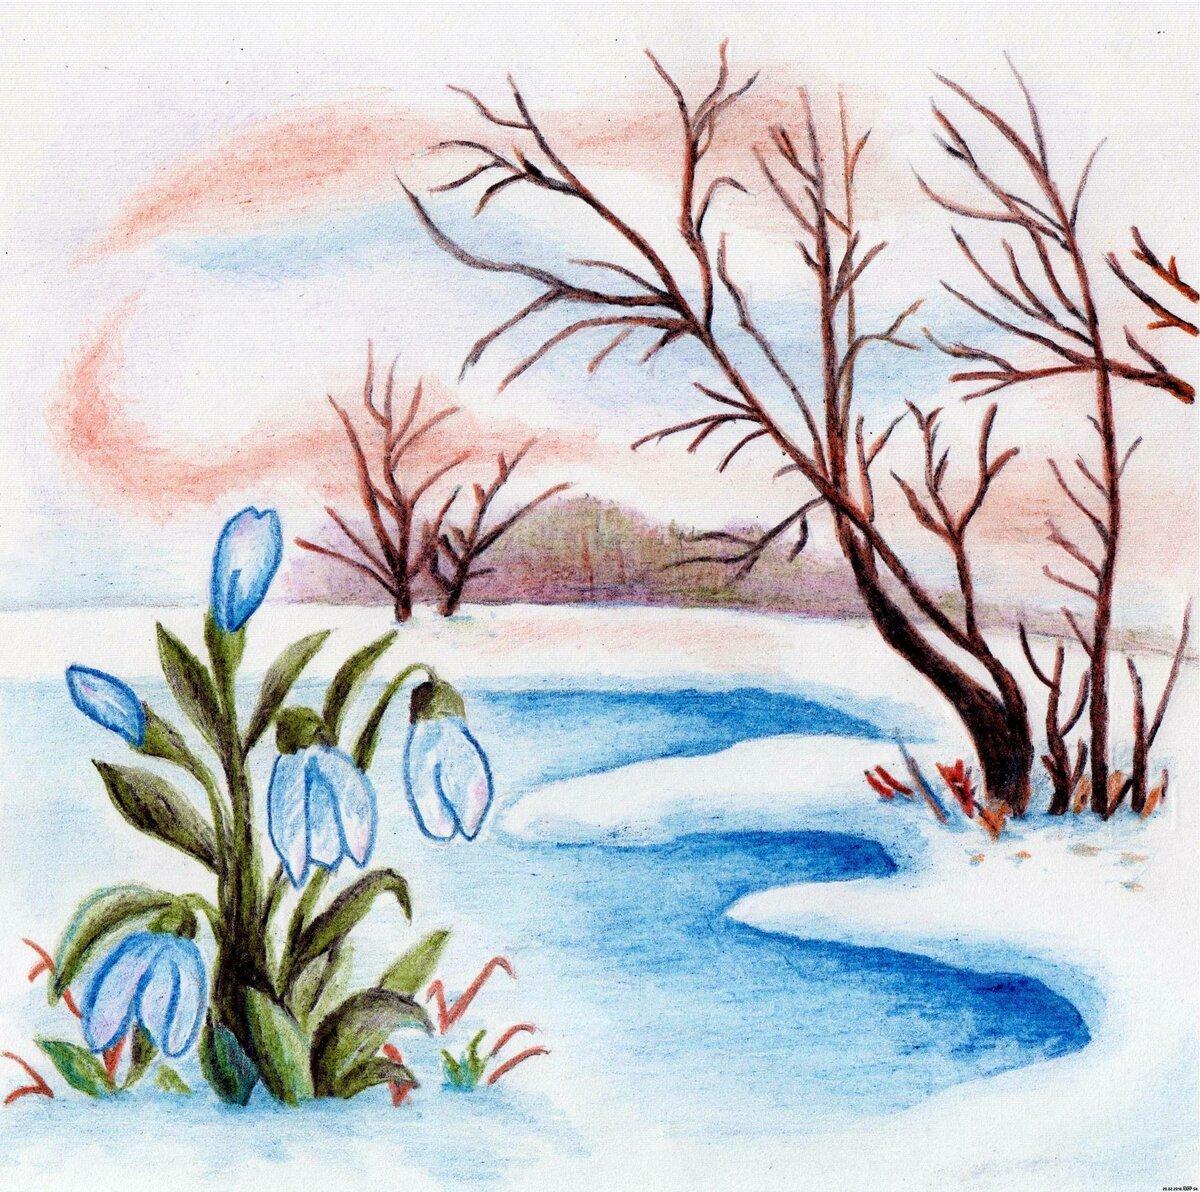 весенние рисунки карандашом легкие маневренная качалка